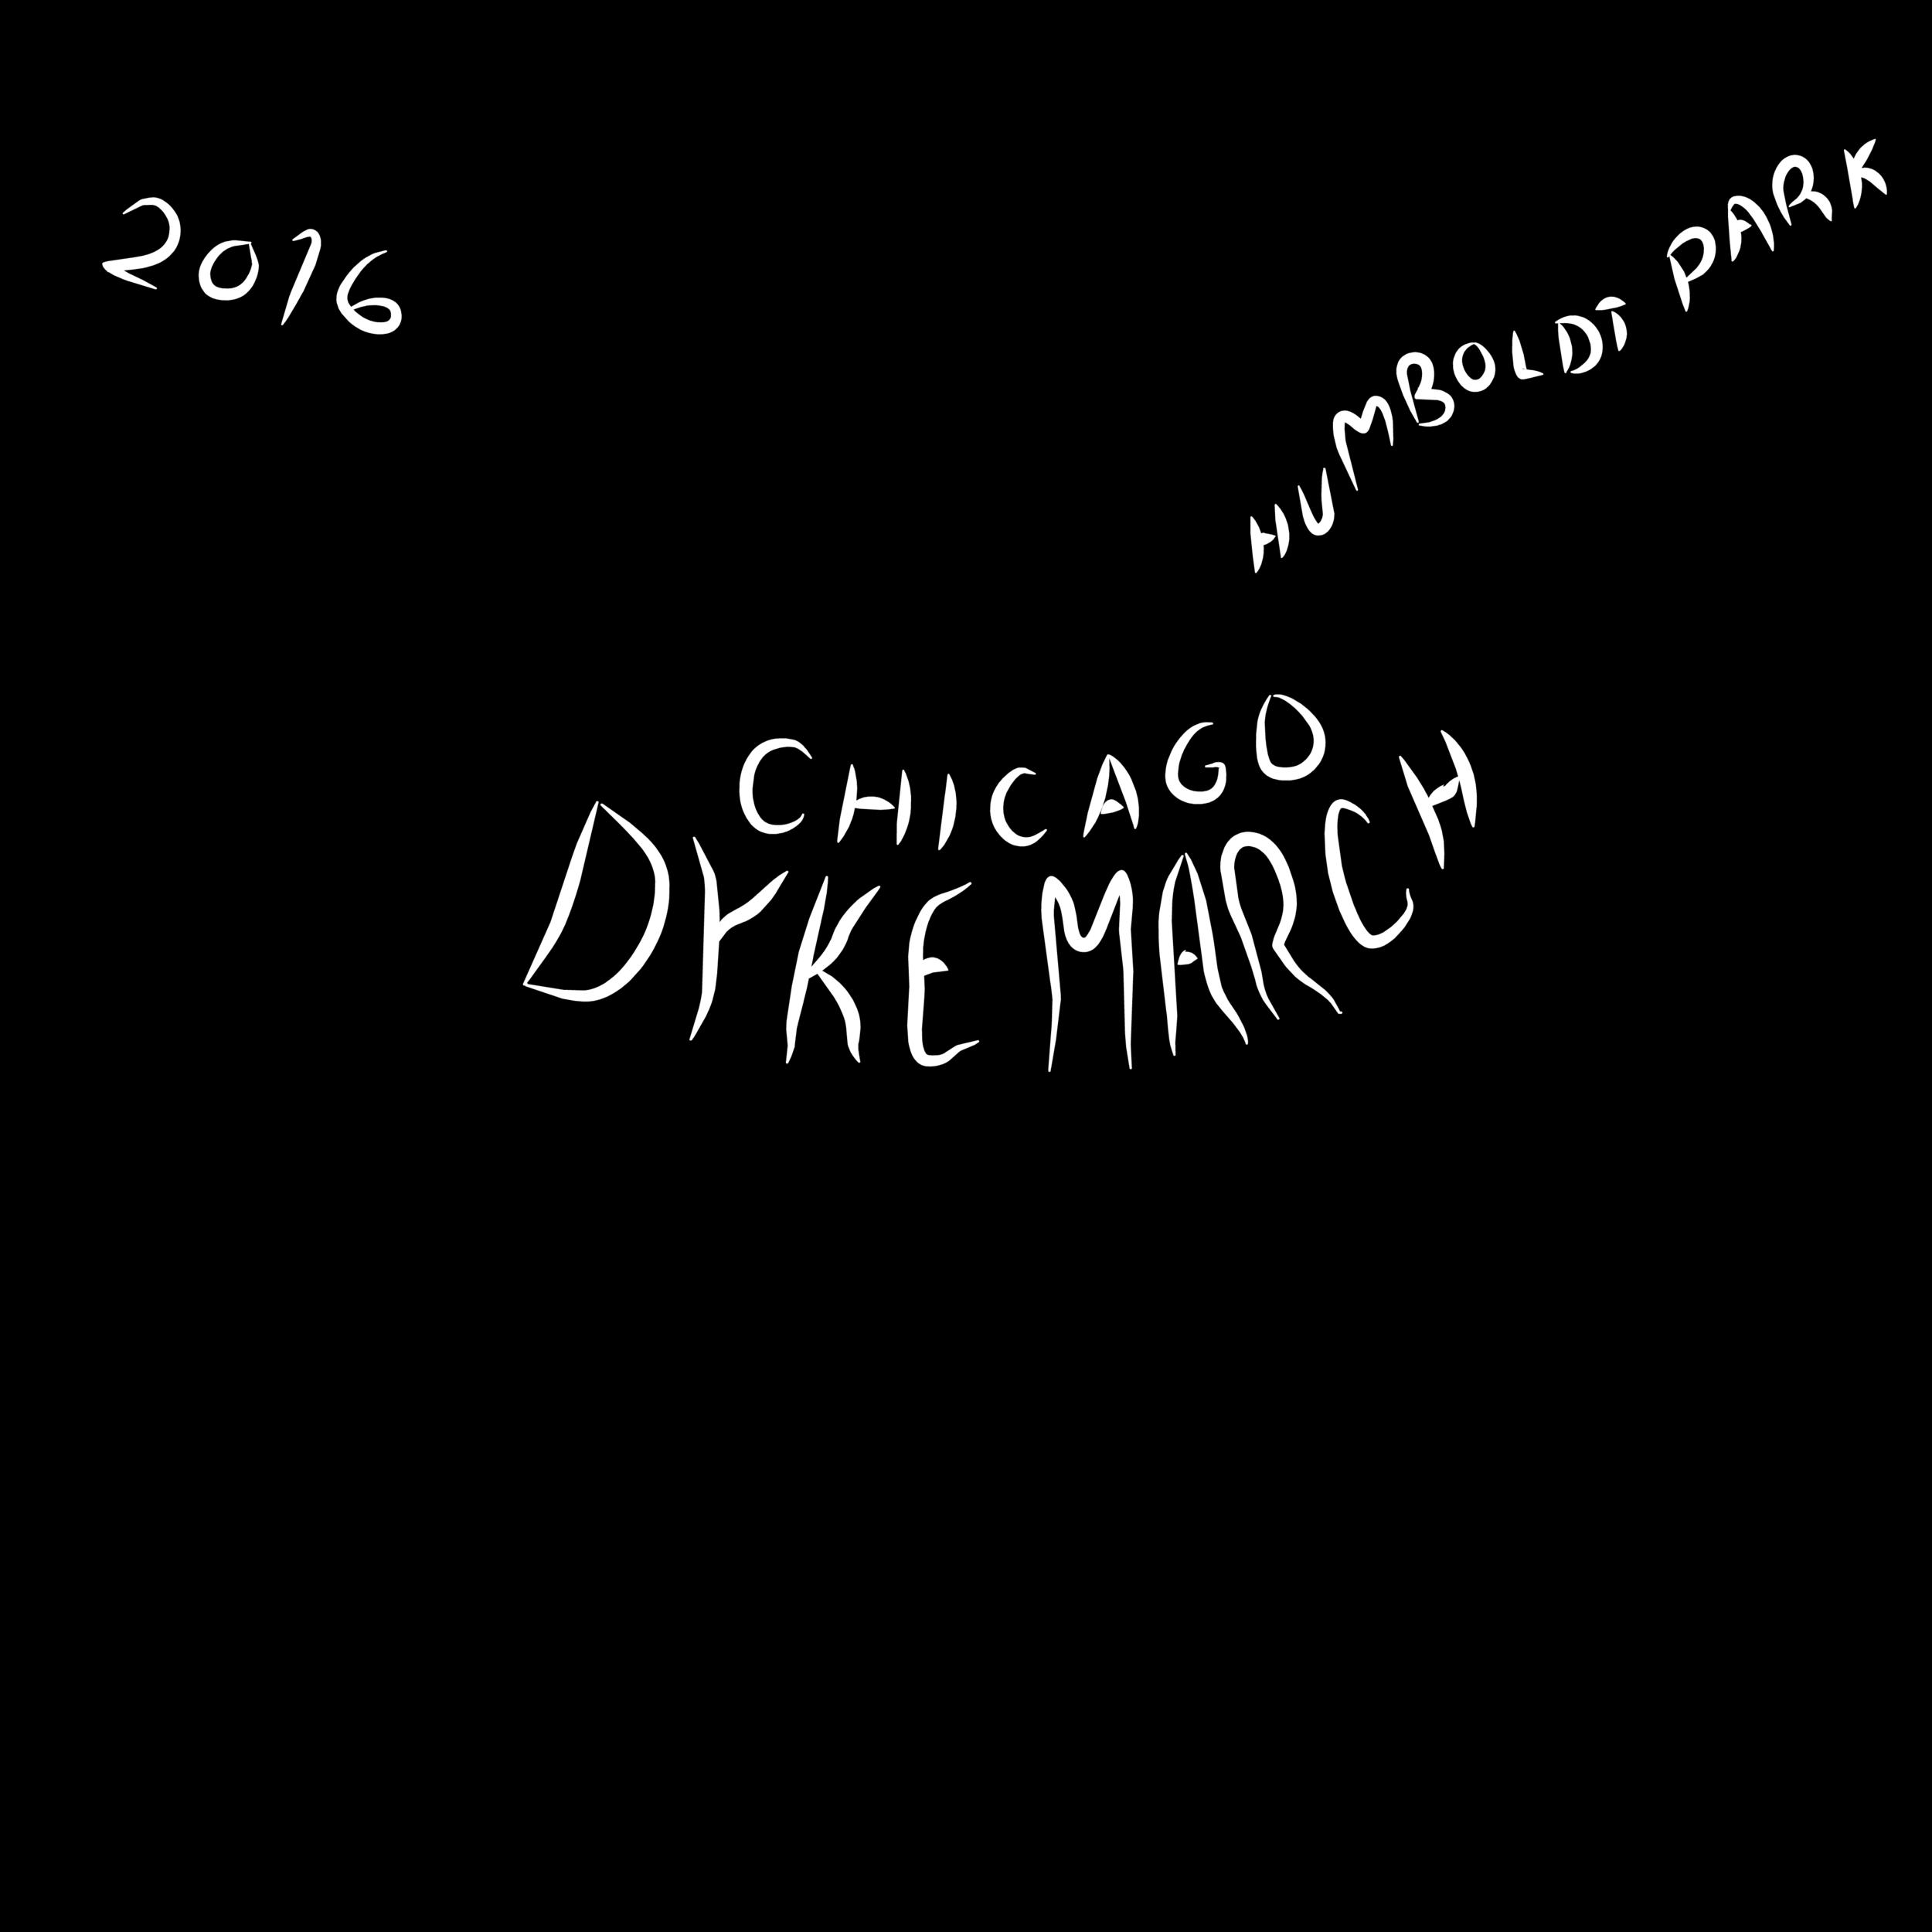 dyke march 2016 - bria royal.jpg.png